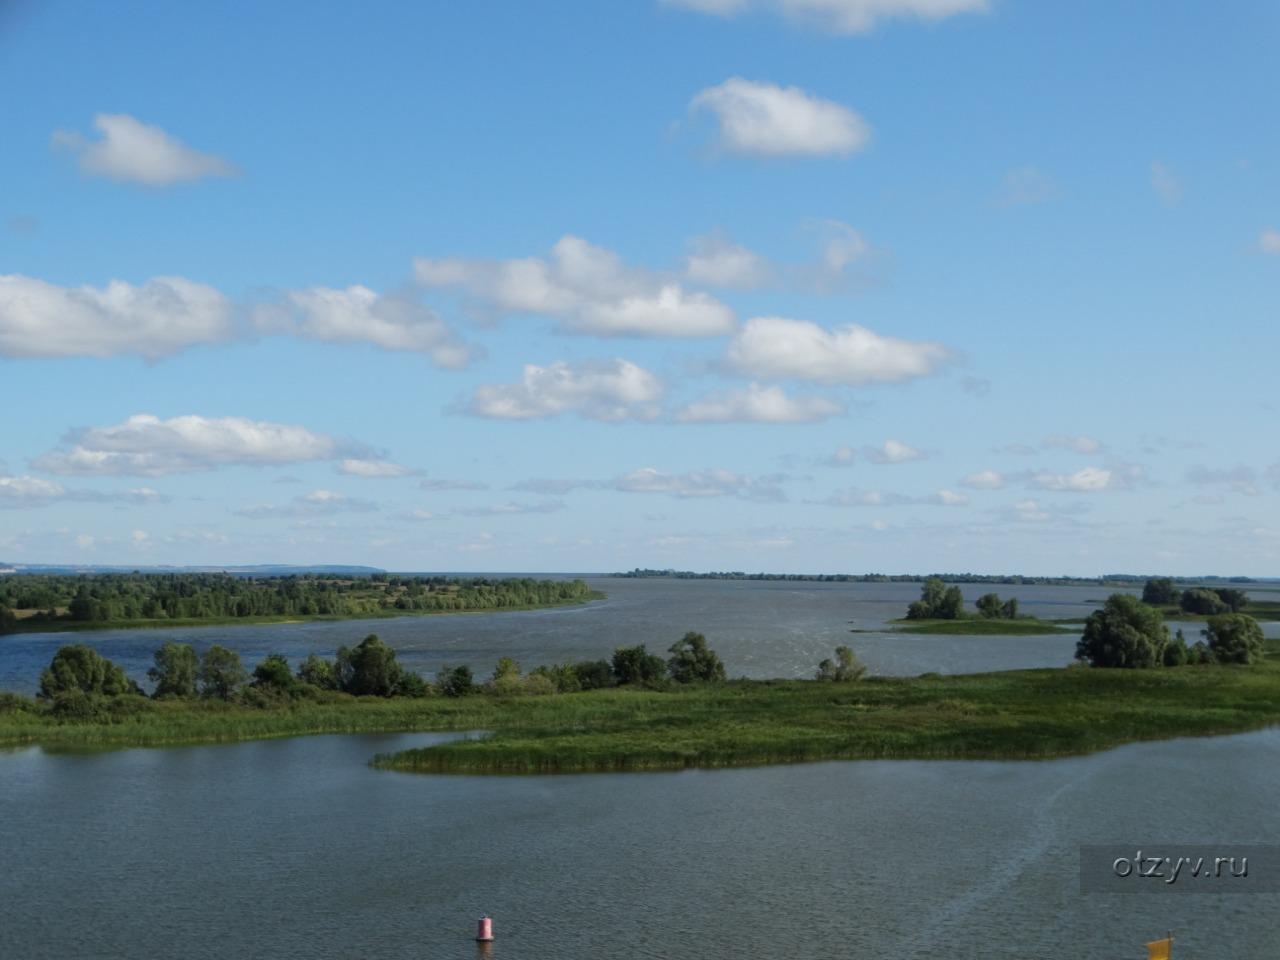 фото биляр озеро полной